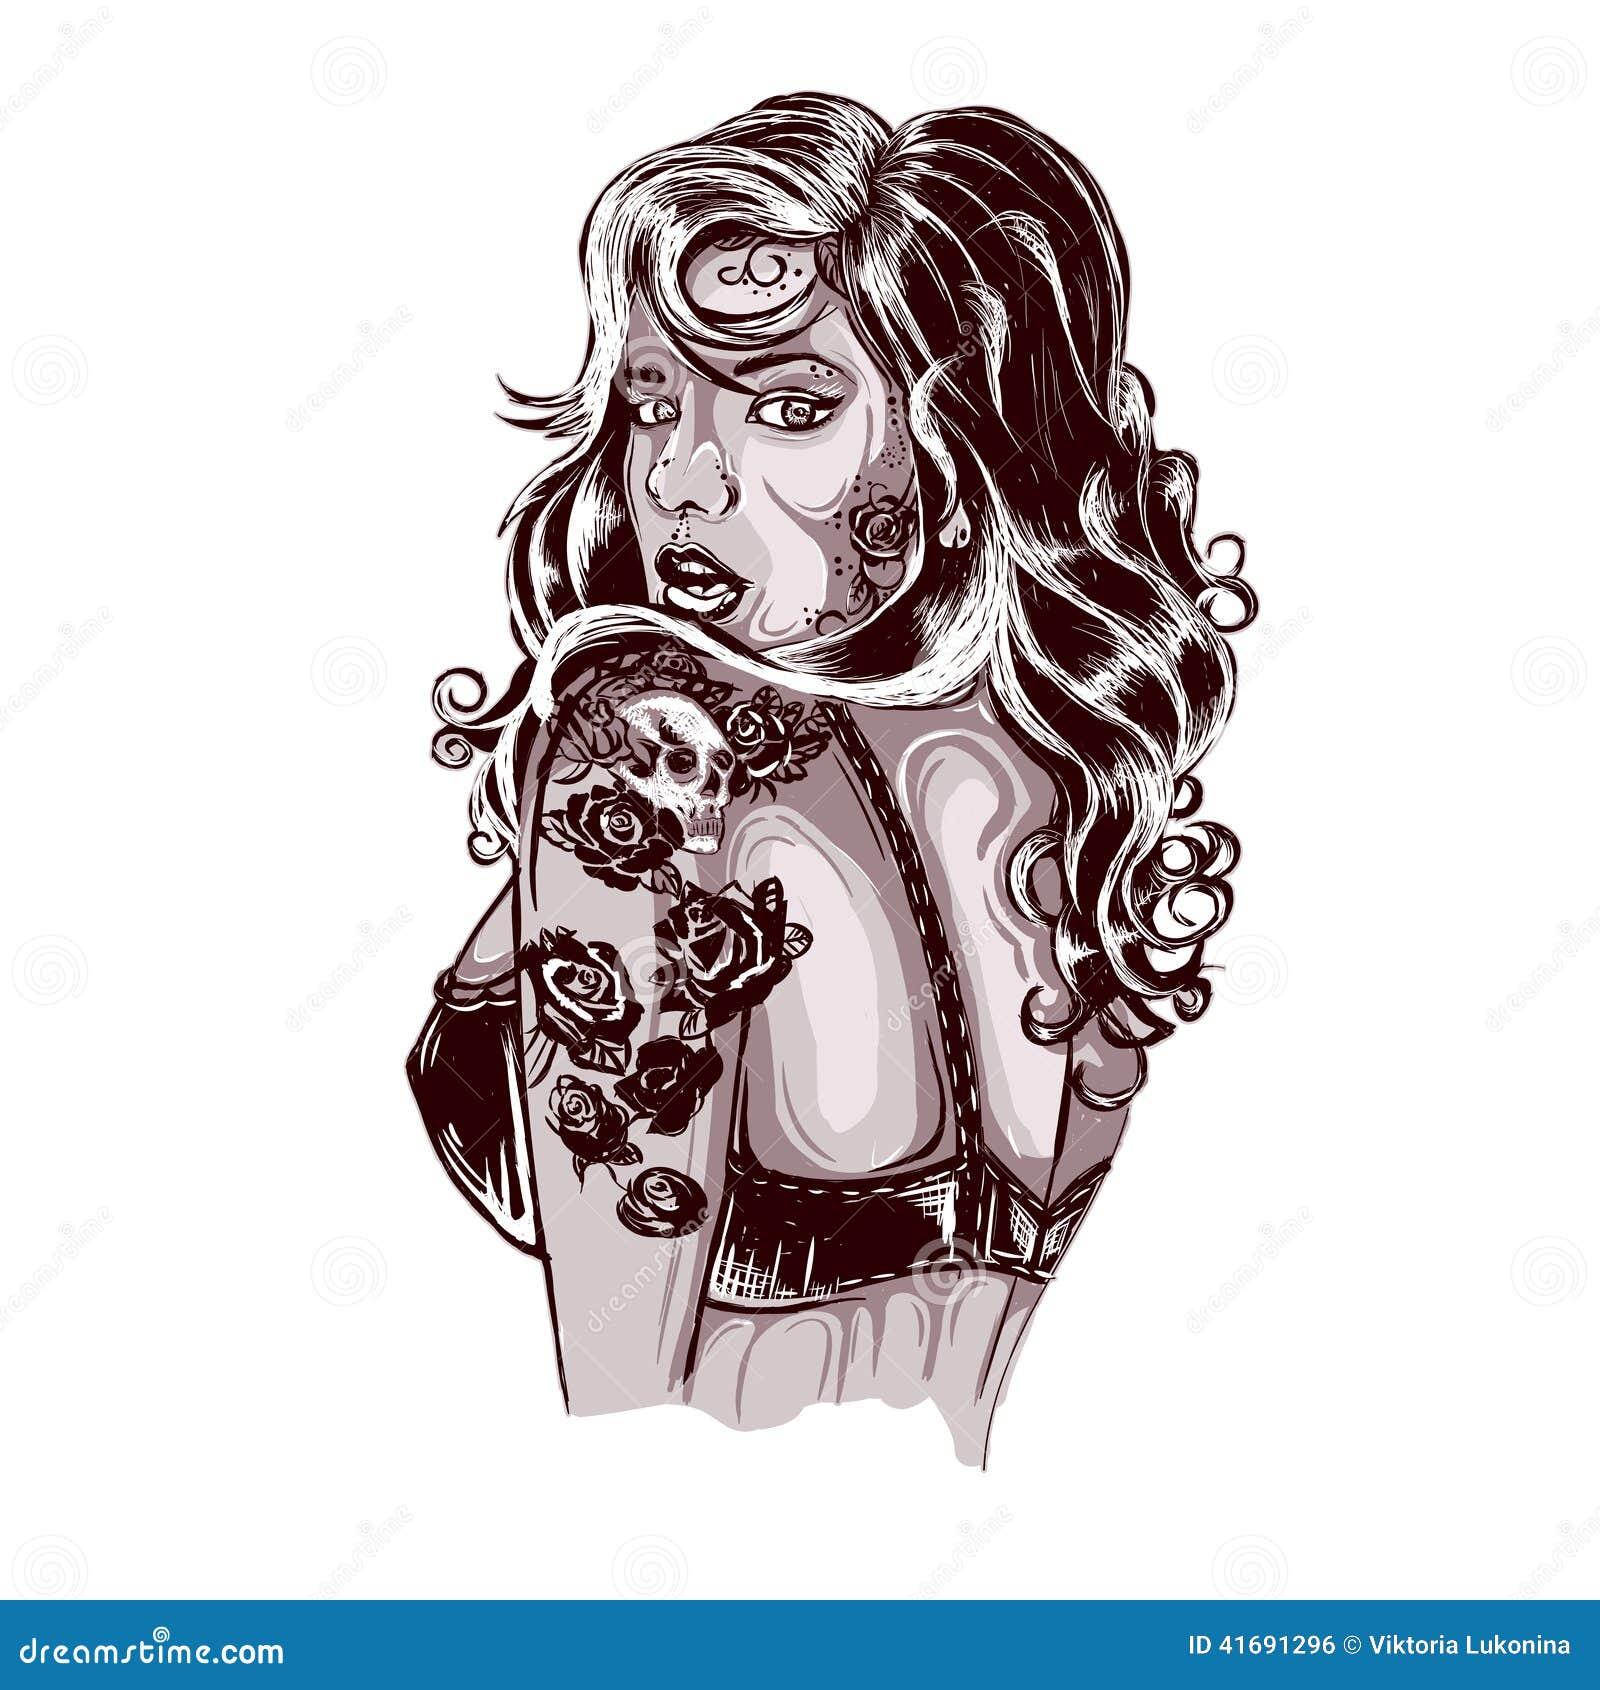 Old school tattoos swallow tattoo design shop tattooed lady picture